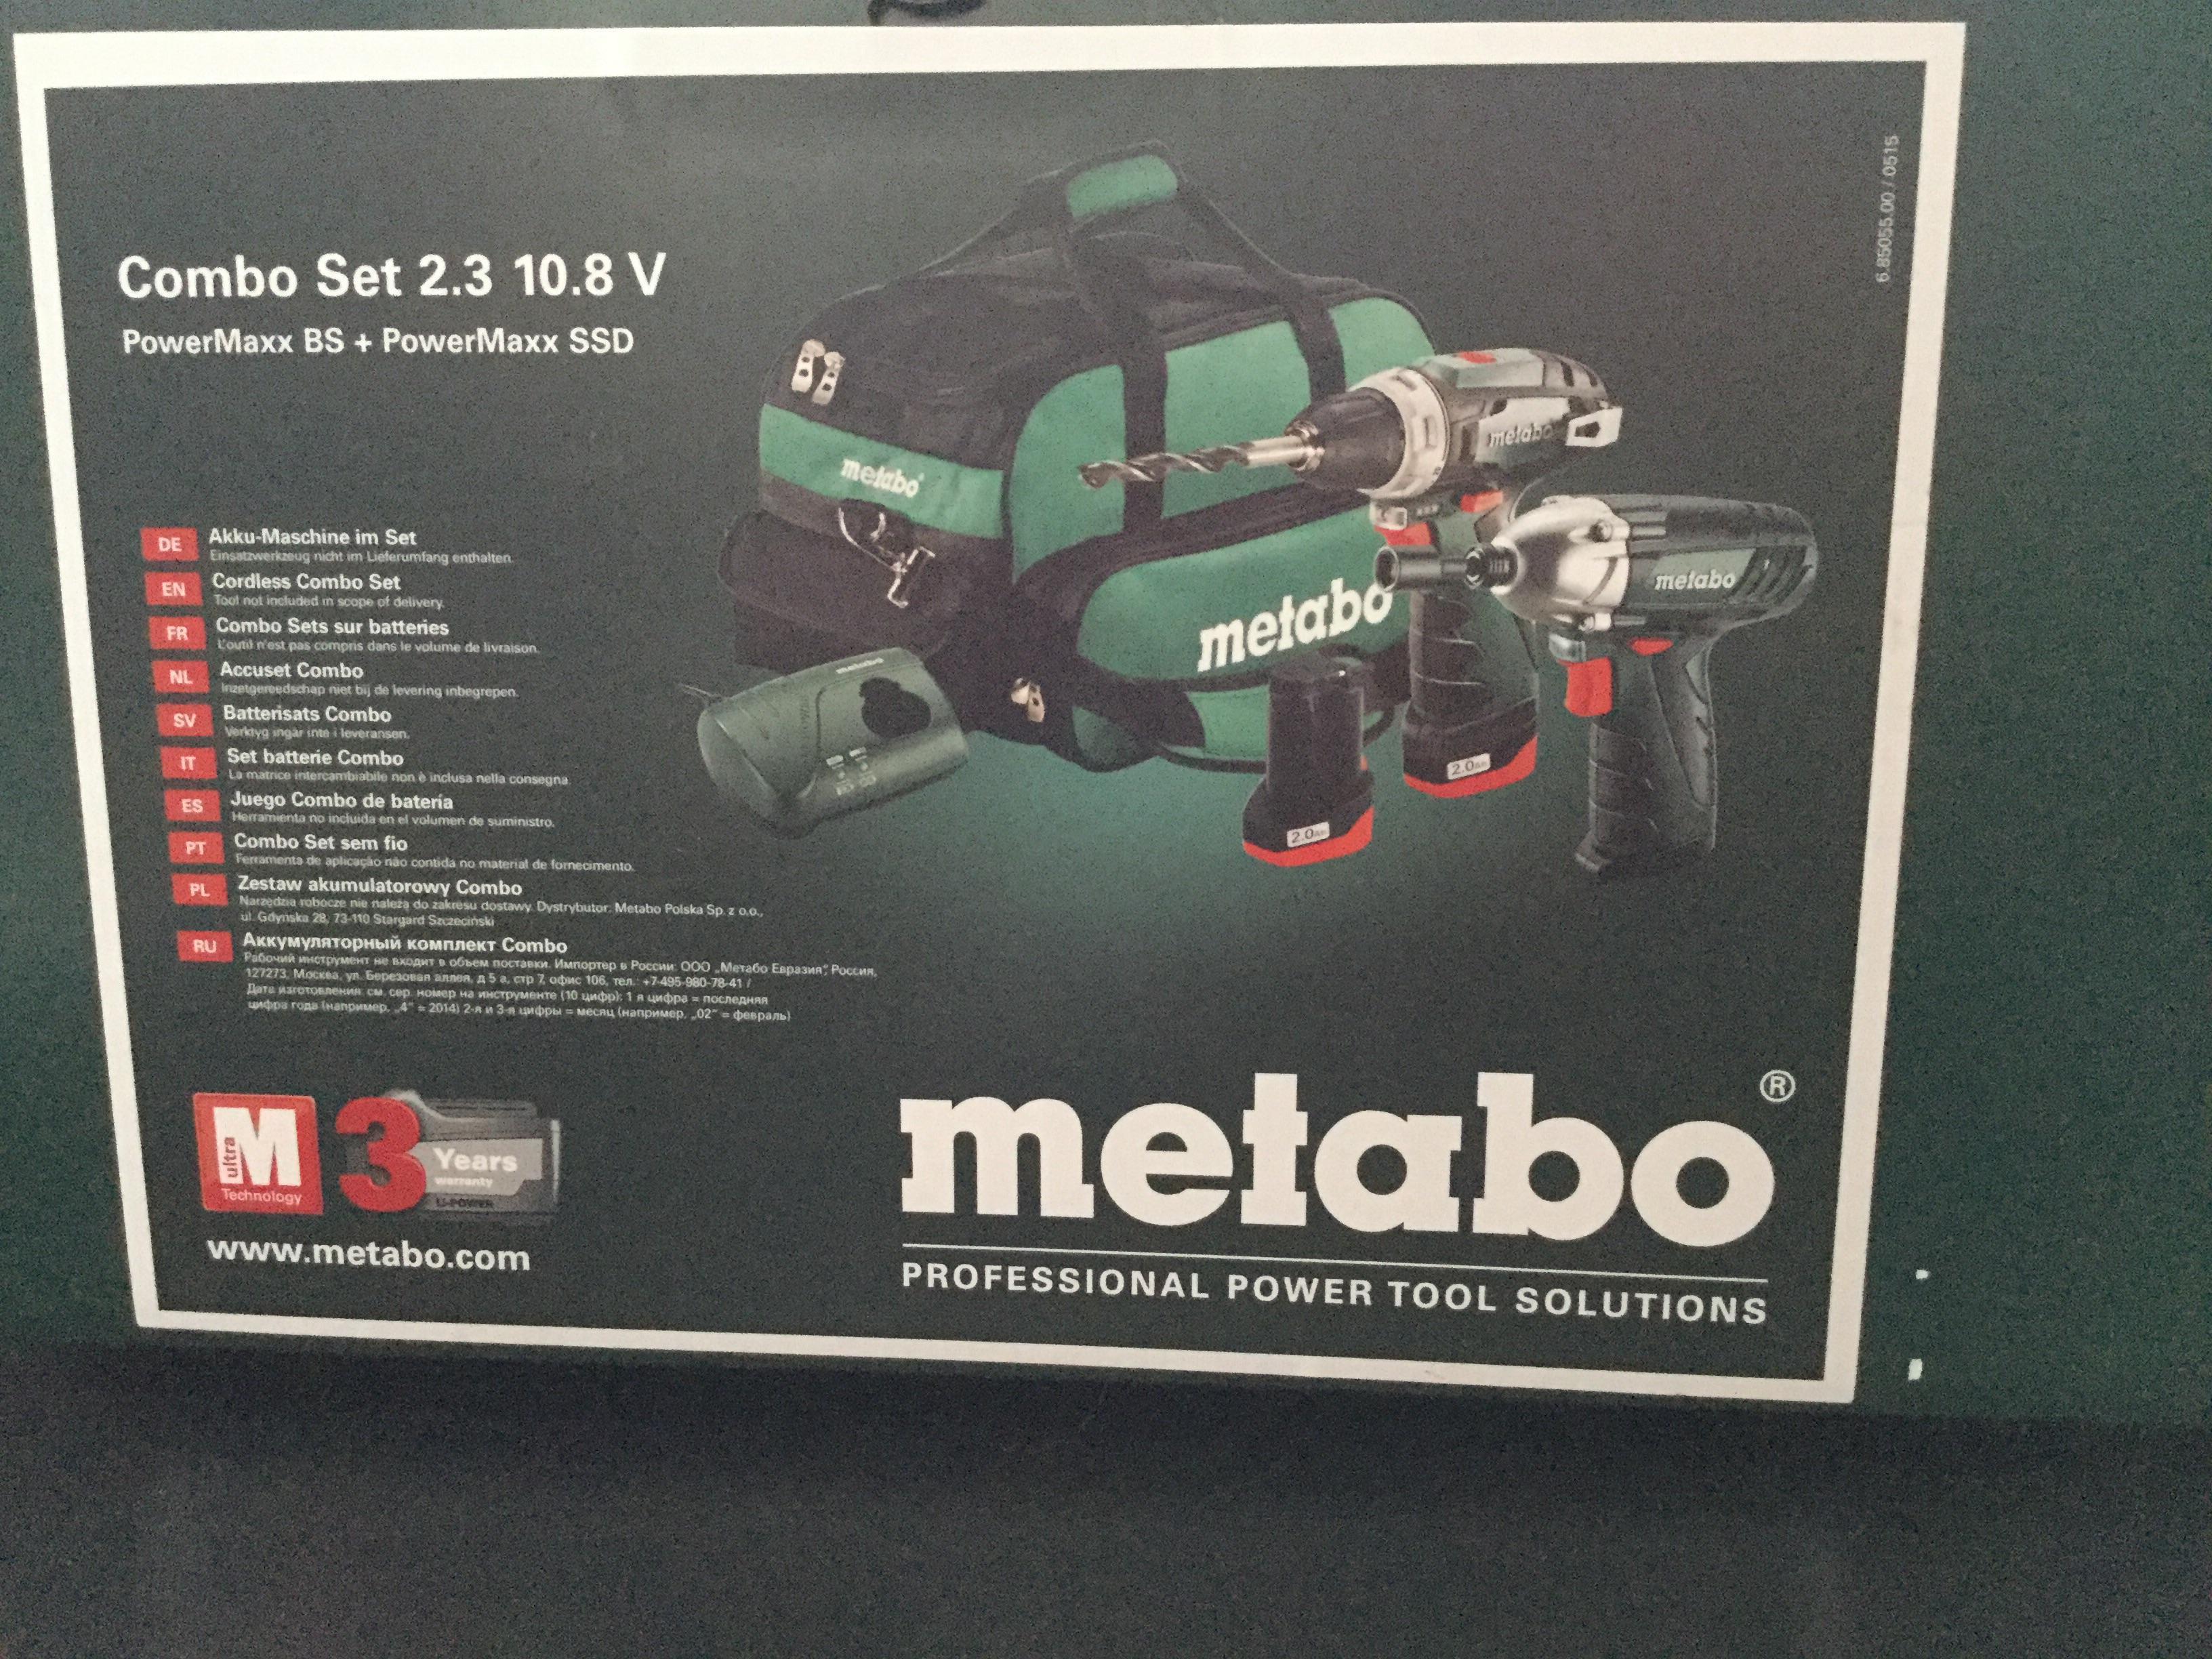 Set perceuse-visseuse + visseuse à percussion Metabo Combo 2.3 (10.8 V)